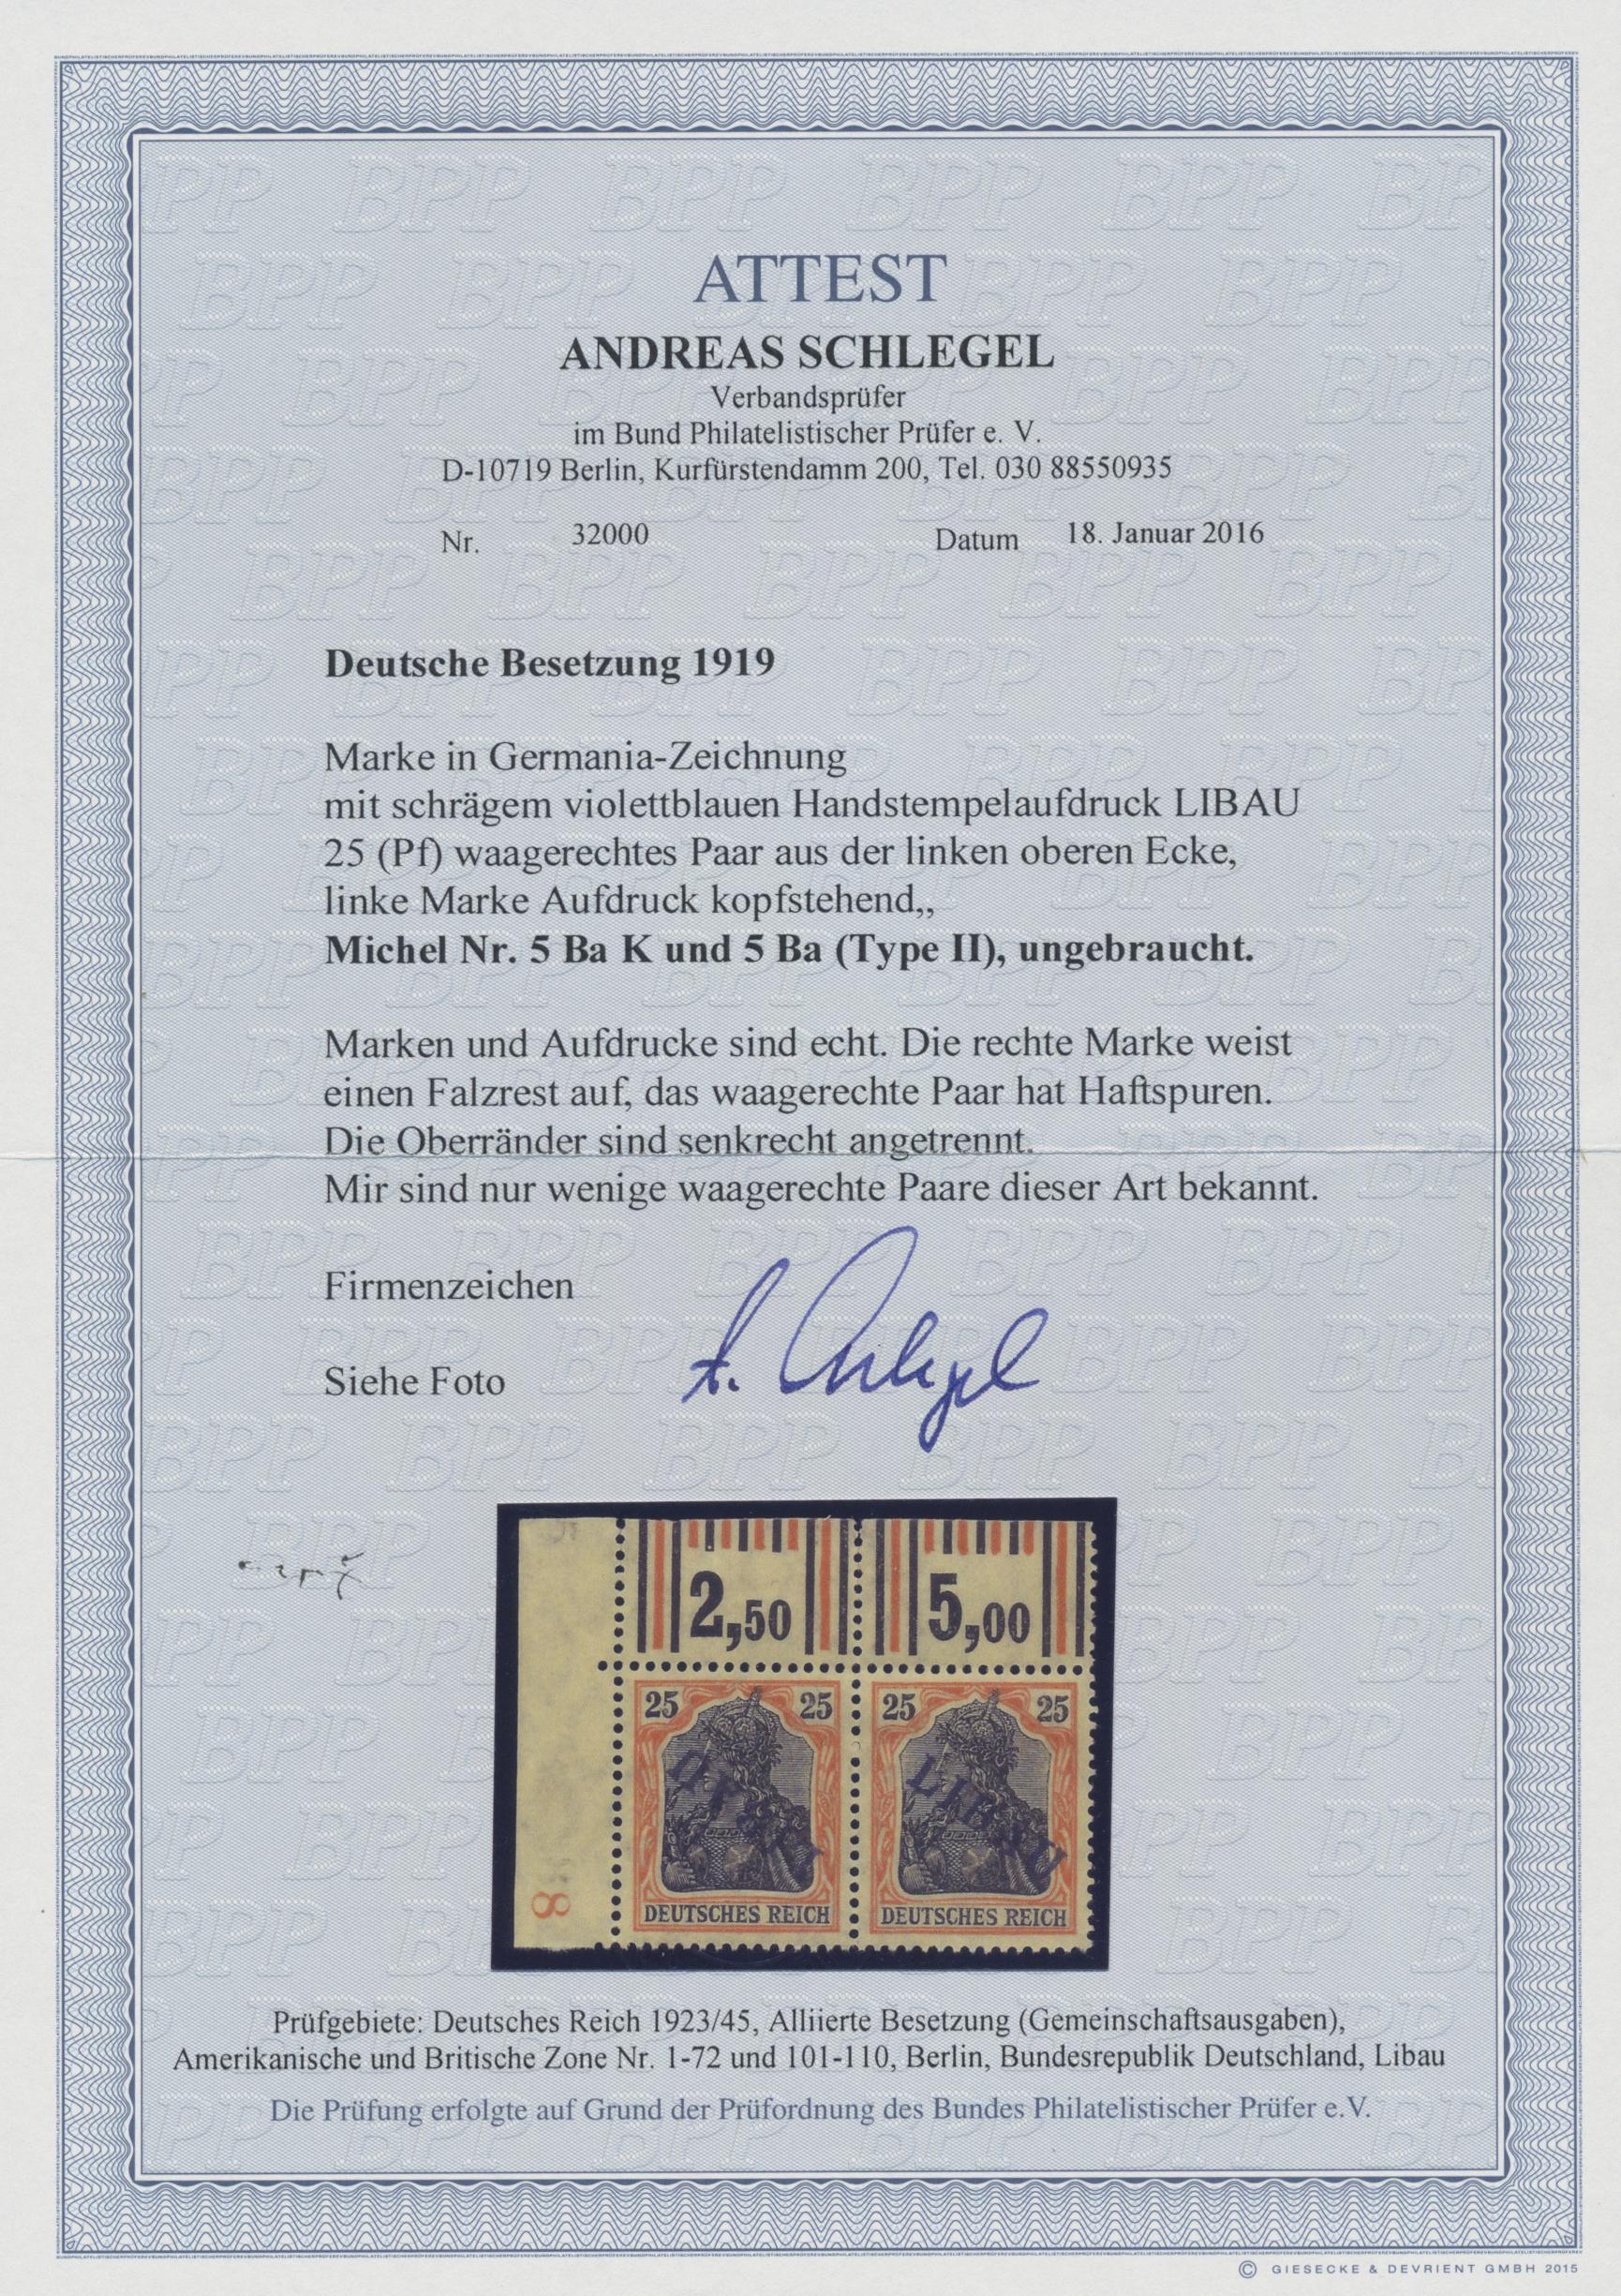 Lot 00012 - Deutsche Besetzung I. WK: Postgebiet Ober. Ost - Libau  -  Auktionshaus Christoph Gärtner GmbH & Co. KG Sale #44 The PETER ZGONC COLLECTION